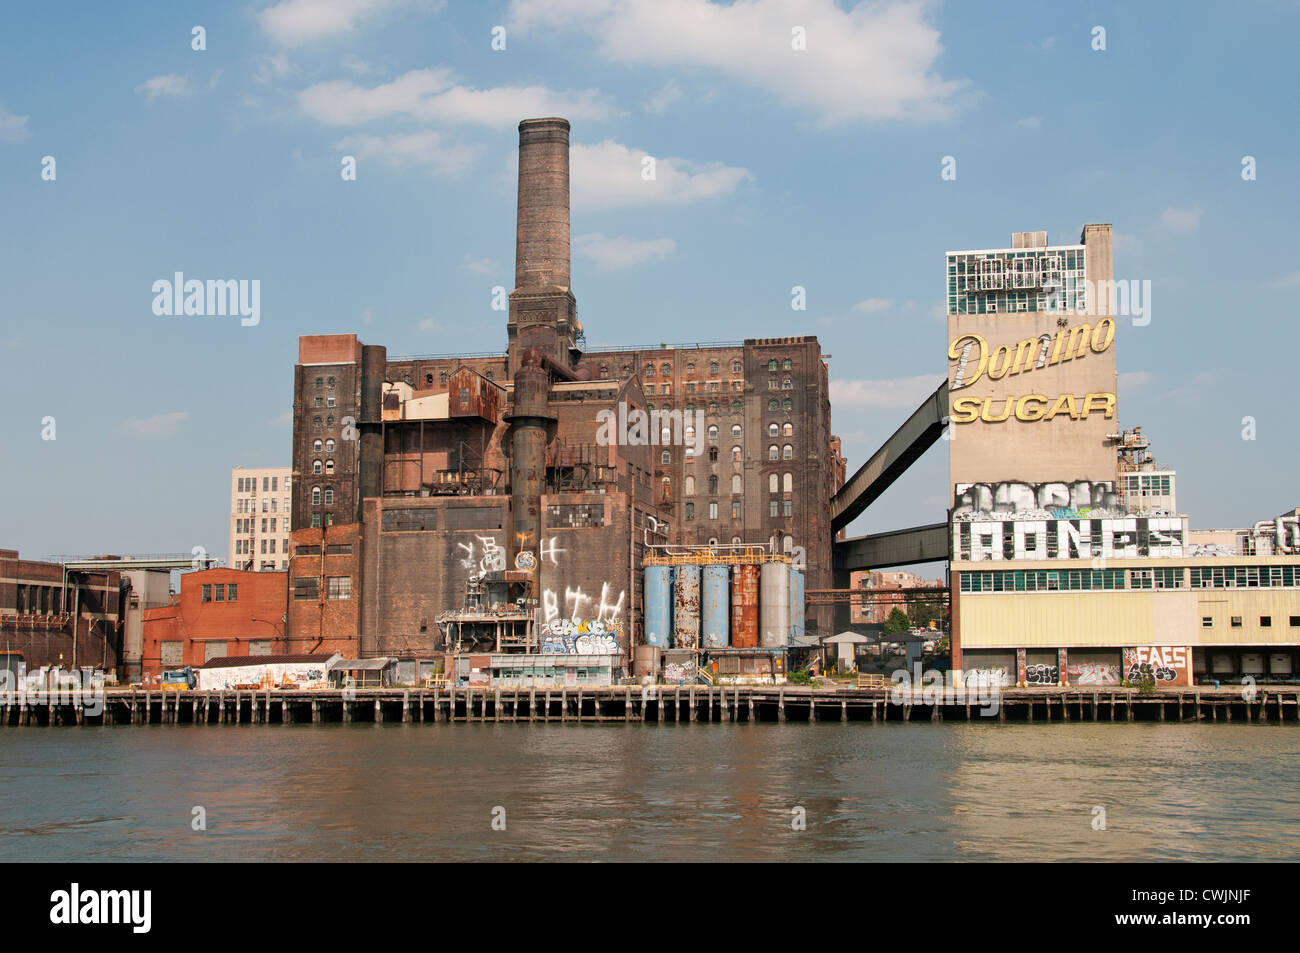 Domino Sugar refinery  Williamsburg Brooklyn New York United States of America - Stock Image